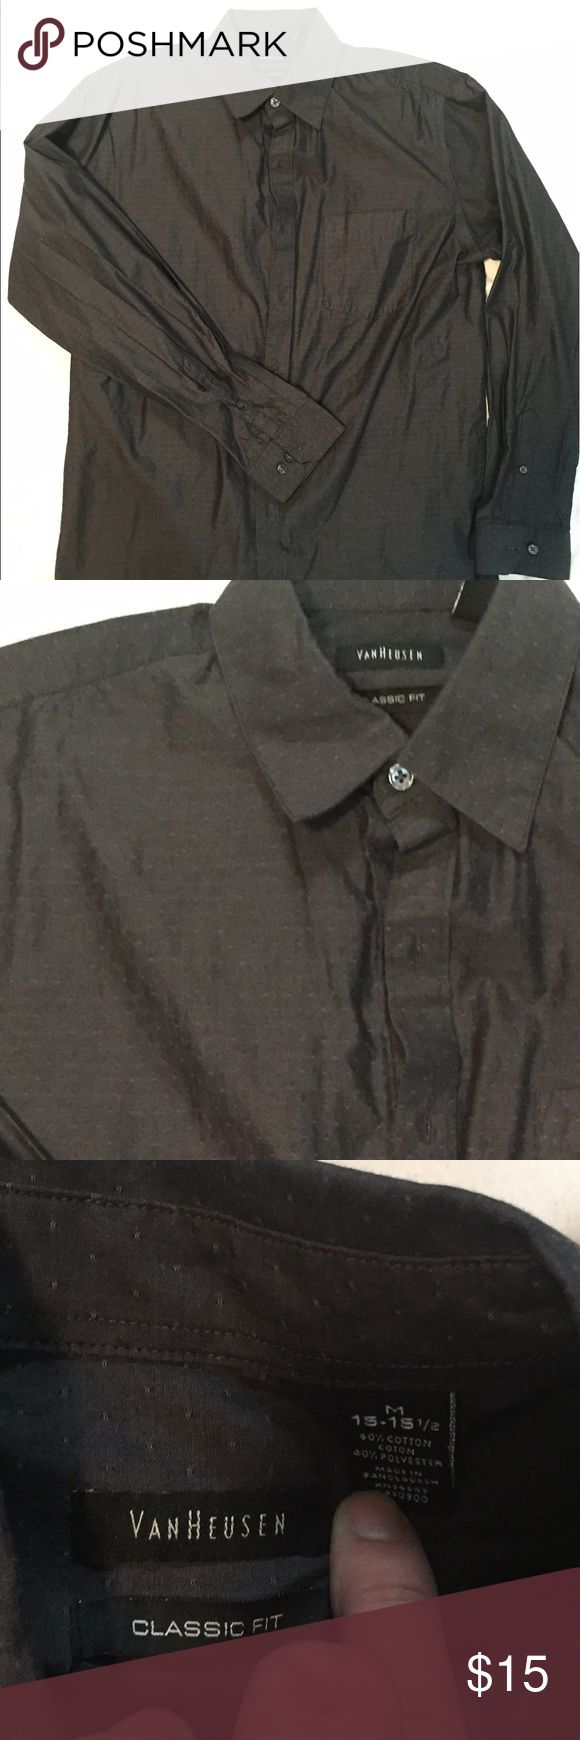 Button down shirt Charcoal gray button down polka dot shirt Van Heusen Shirts Casual Button Down Shirts